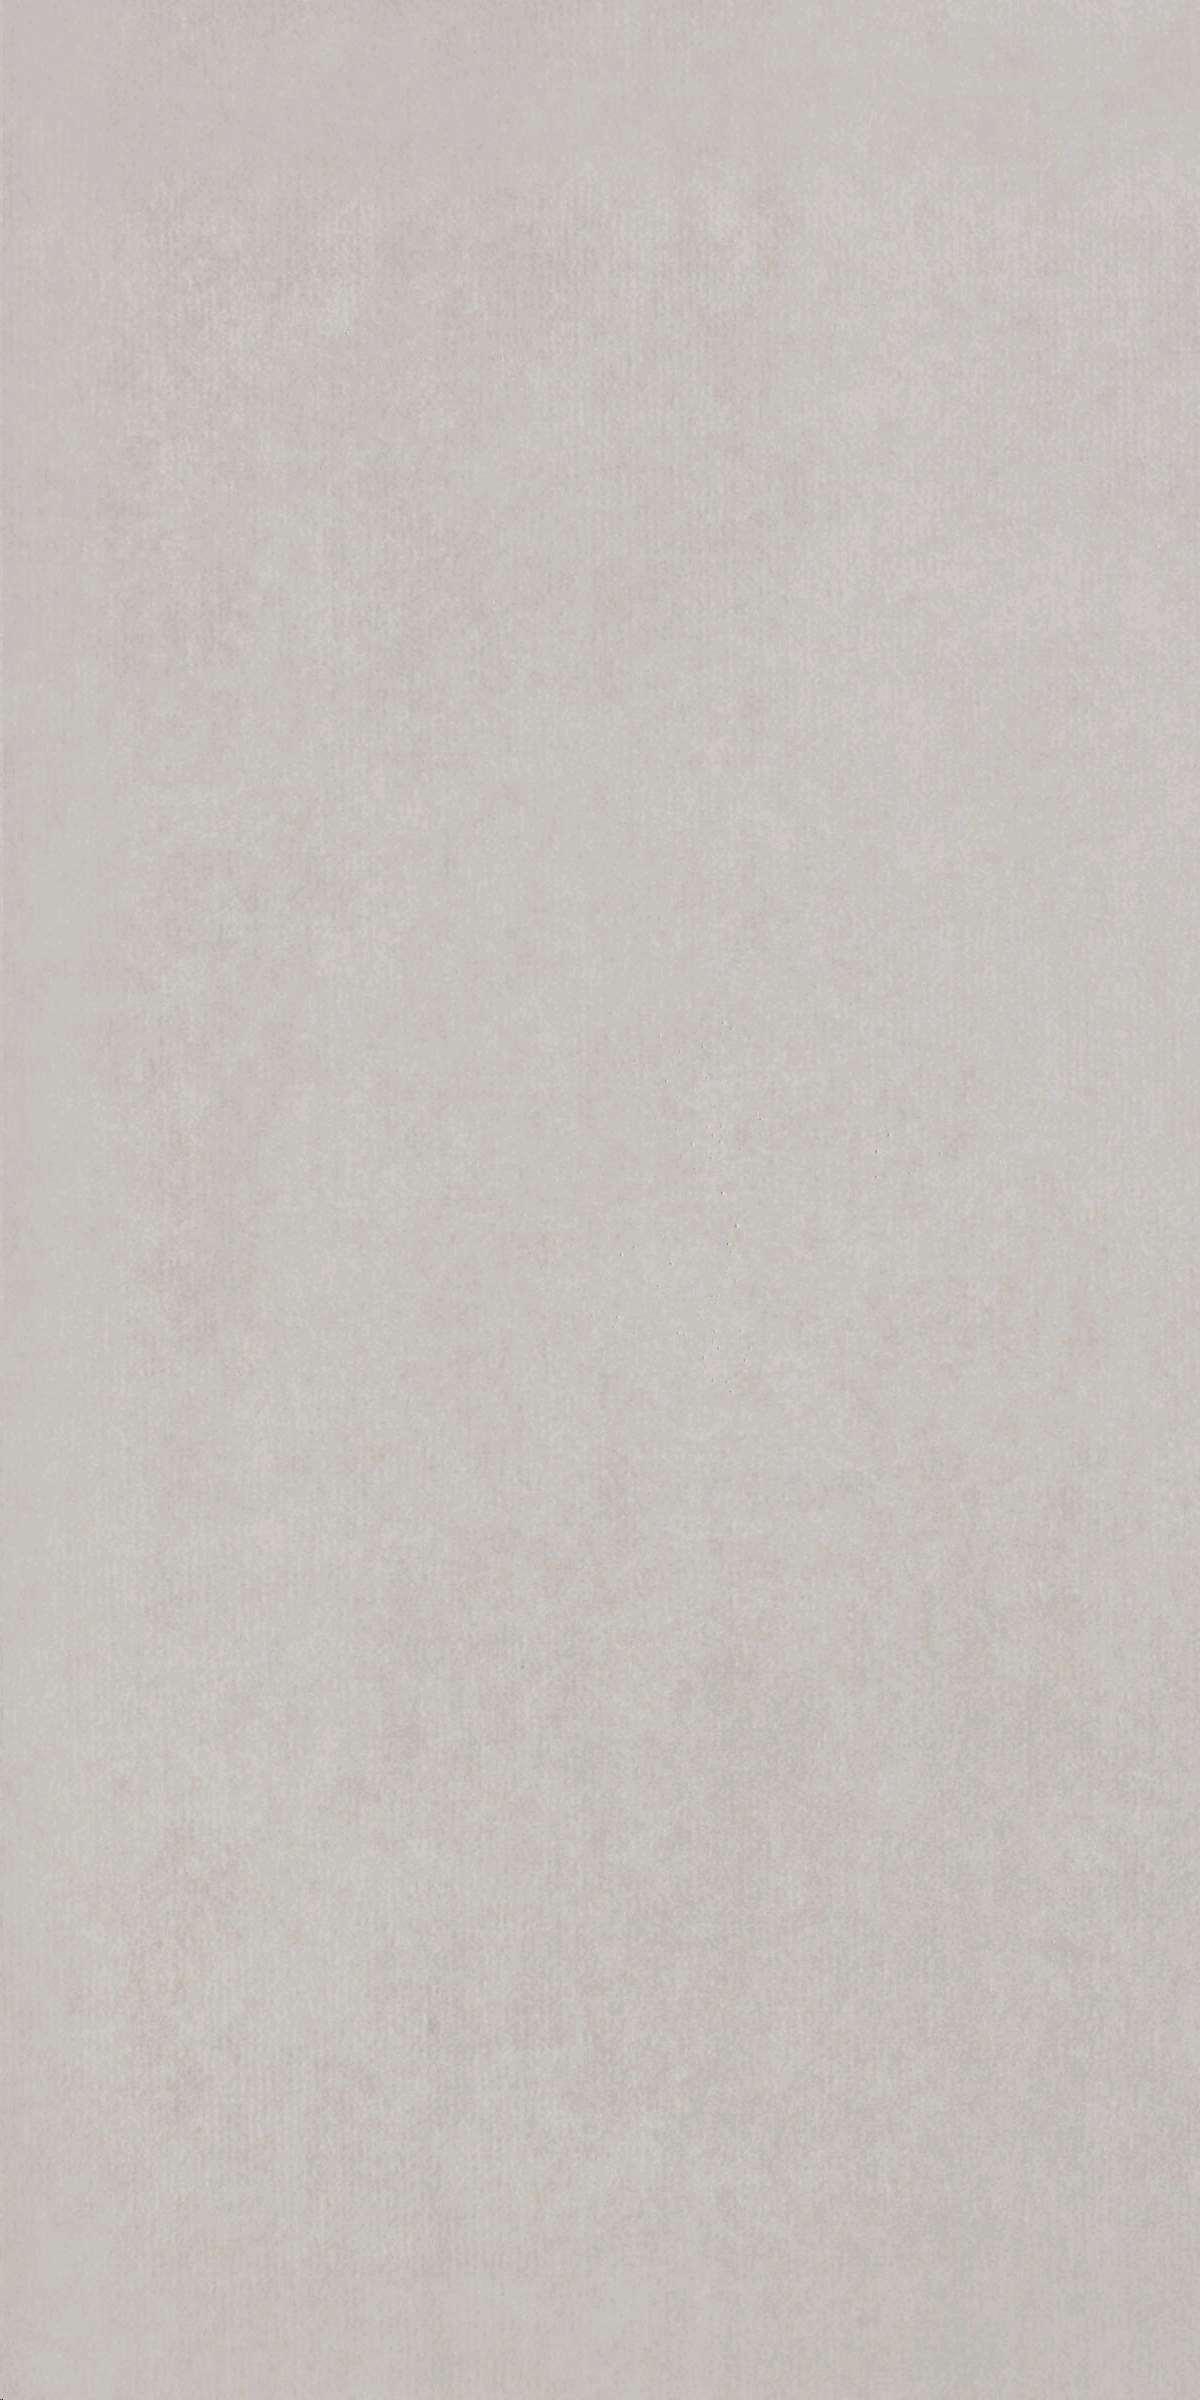 Carrelage pavigres grespor rayon argent lapp gris 60 x 30 for Pavigres carrelage